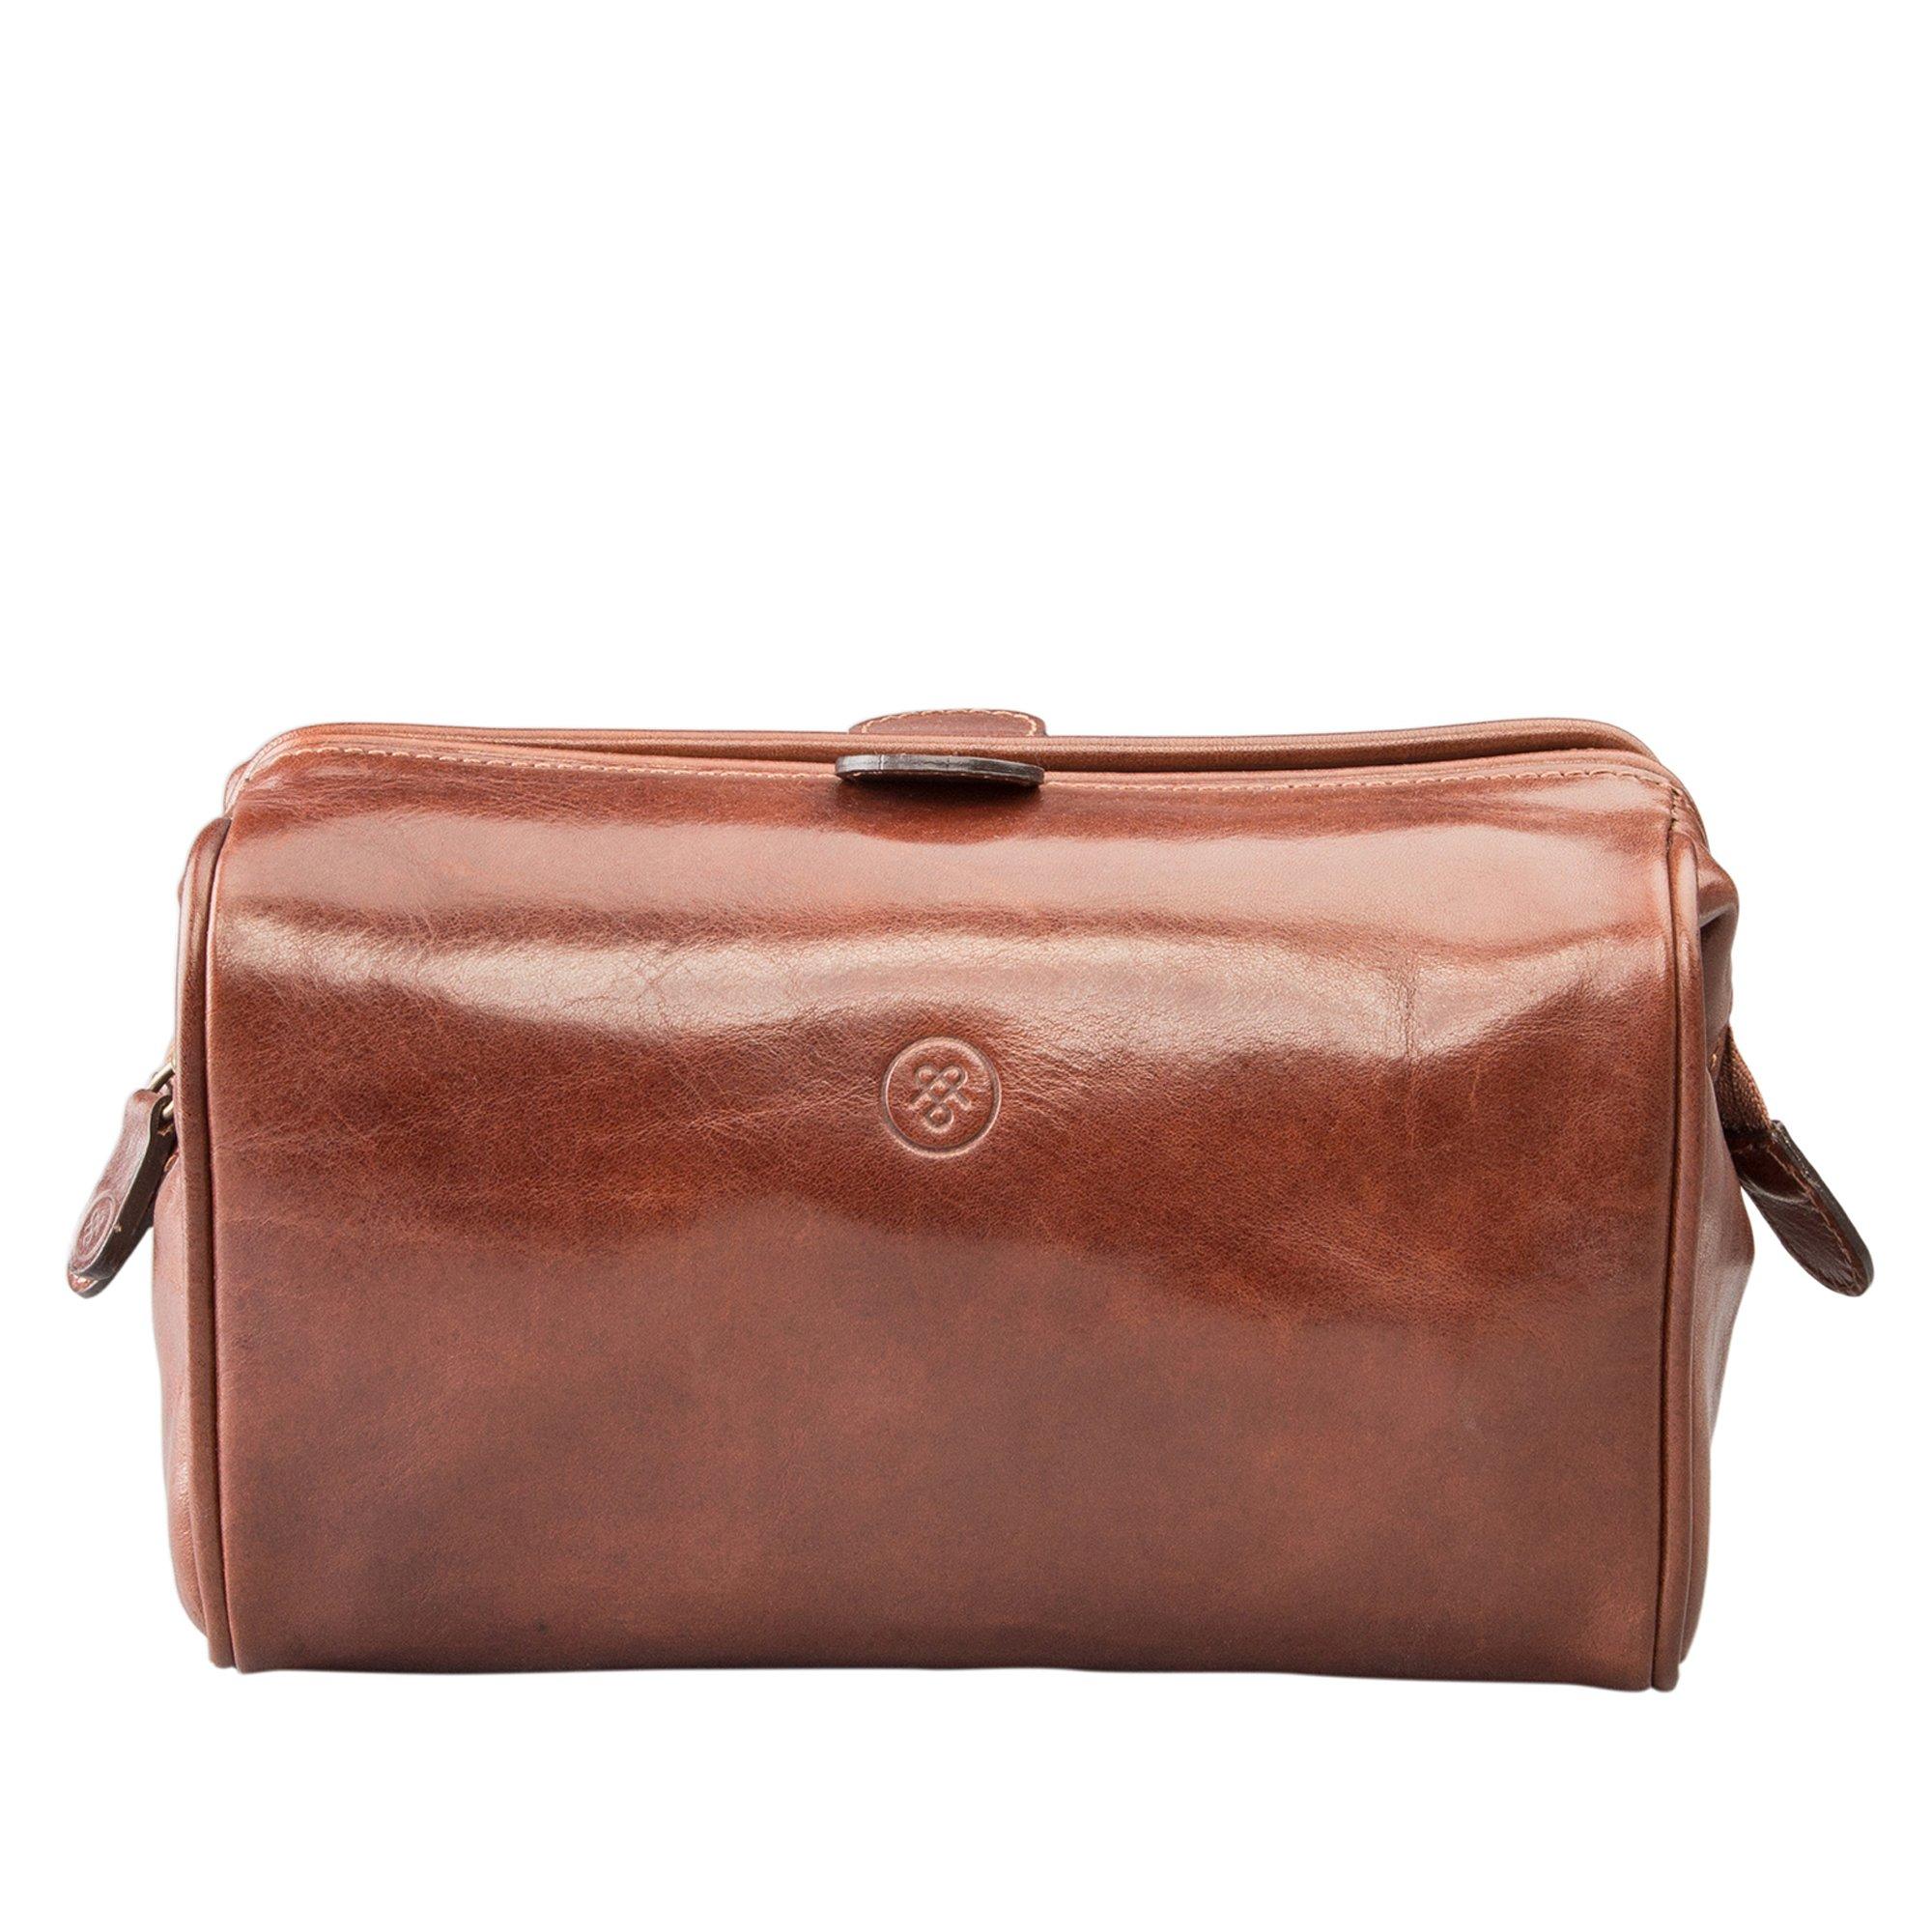 Maxwell Scott Personalized Luxury Tan Leather Soap Bag (The DunoM) - Medium